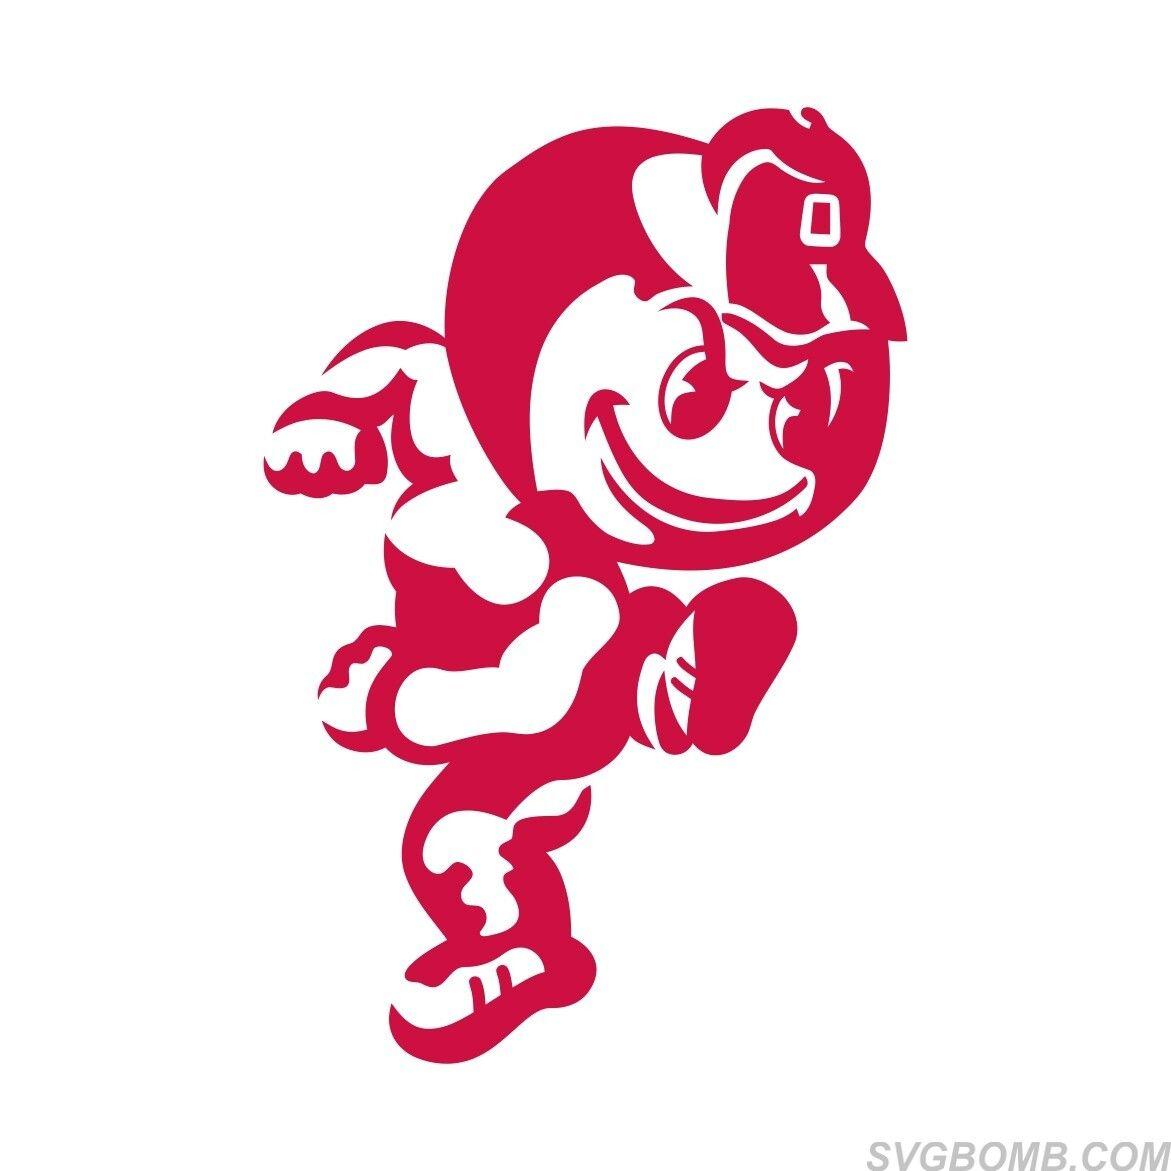 Ohio State Mascot Logo SVG Vector Image | SVGbomb.com